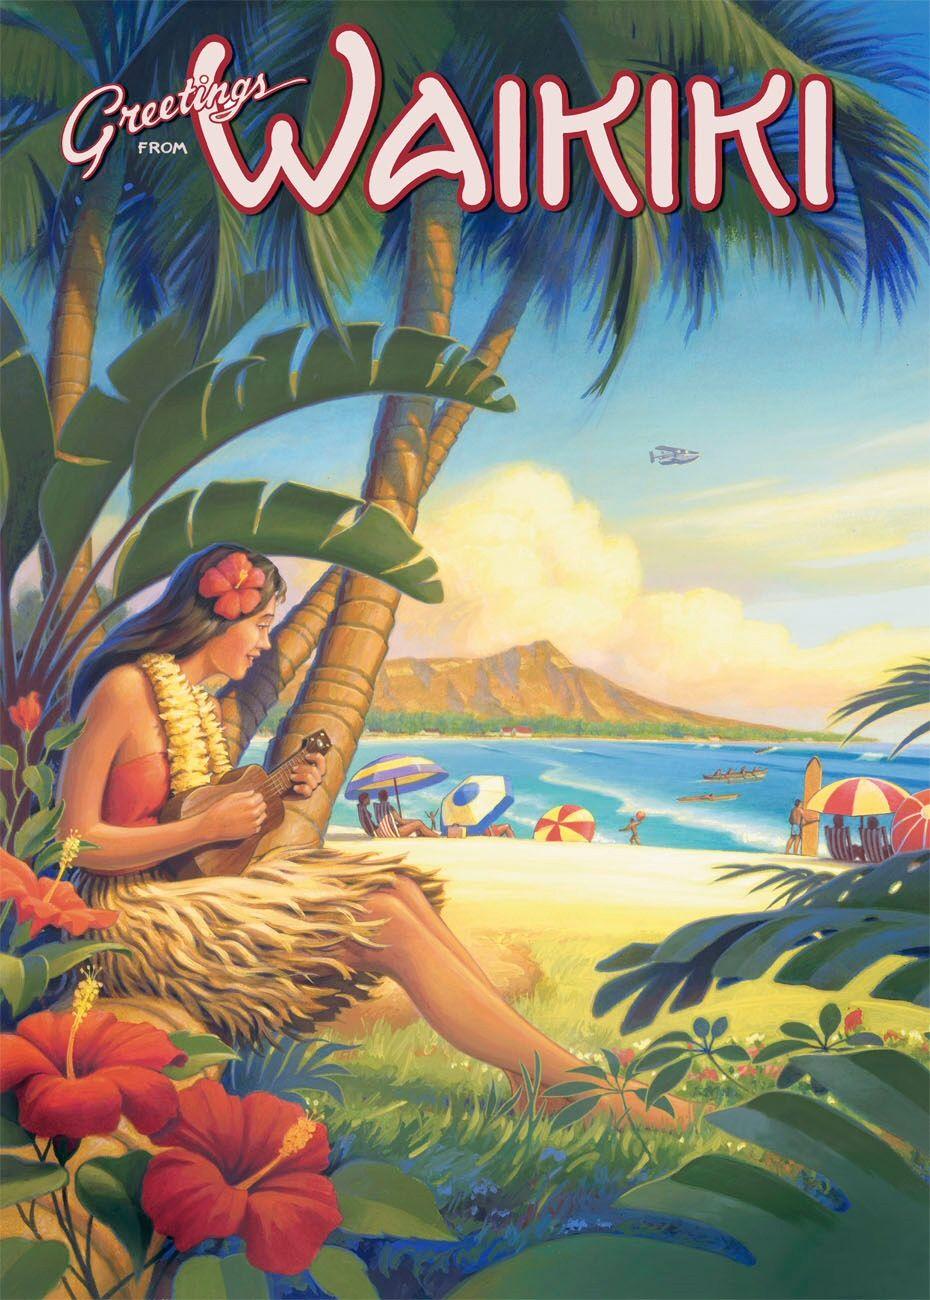 Hawaii travel poster vintage travel usa vintage hawaii hawaiian vintage tin sign postcard greetings from waikiki by kerne erickson kristyandbryce Choice Image